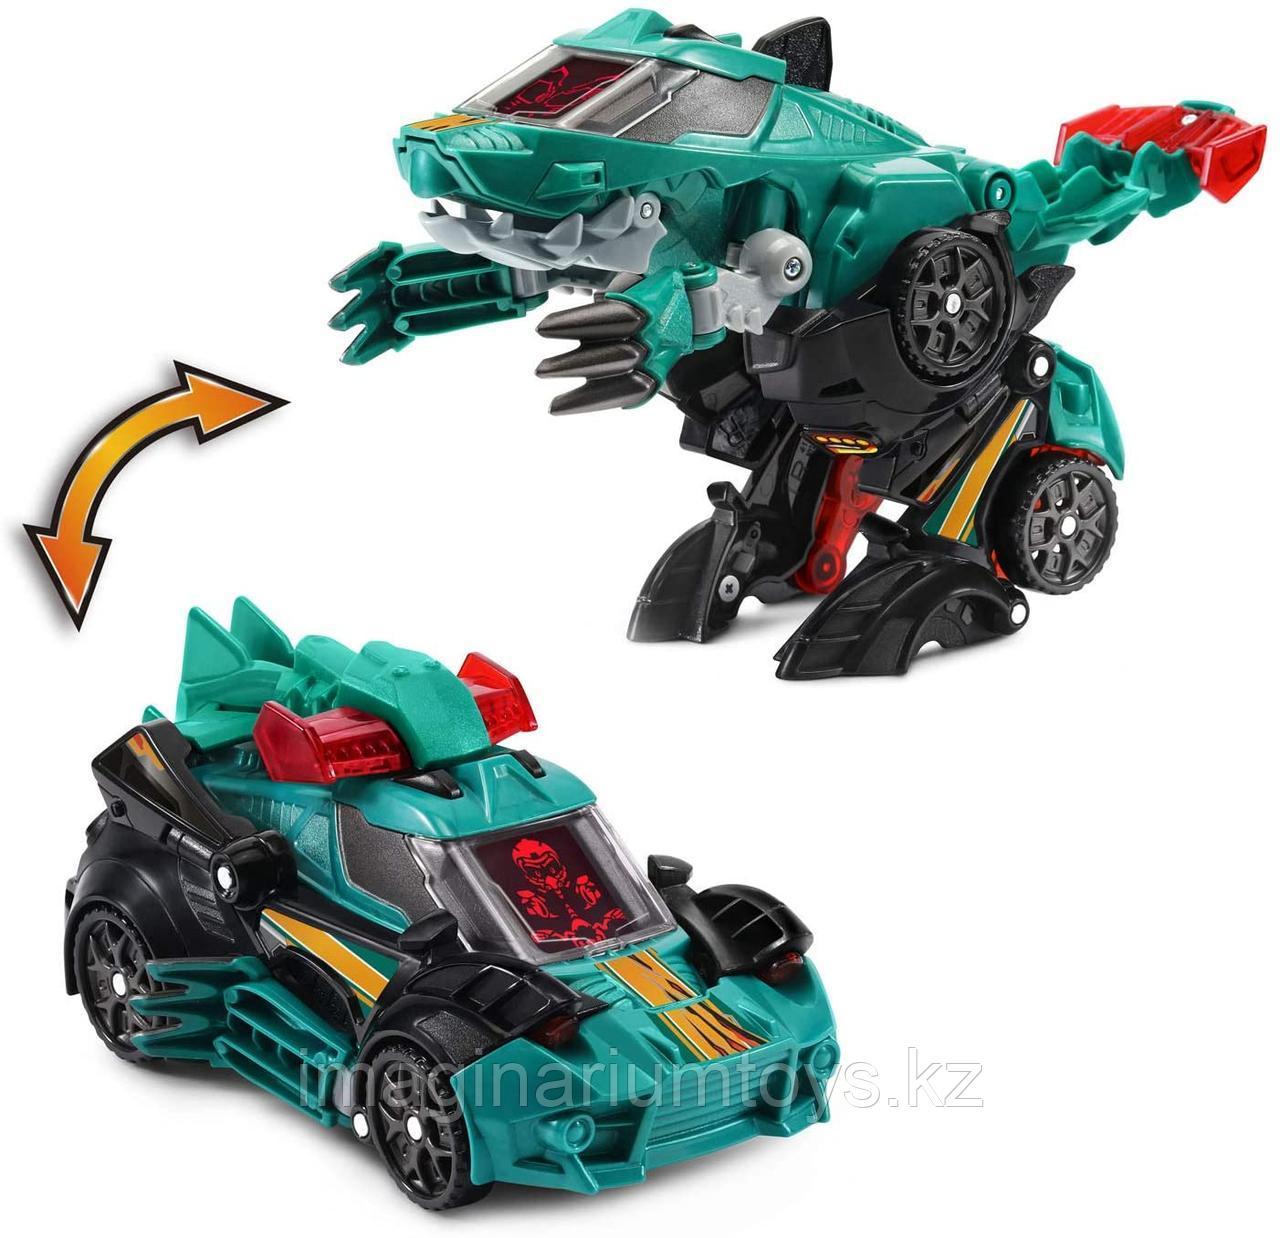 Игрушка трансформер динозавр-машинка VTech Велоцираптор Switch&Go